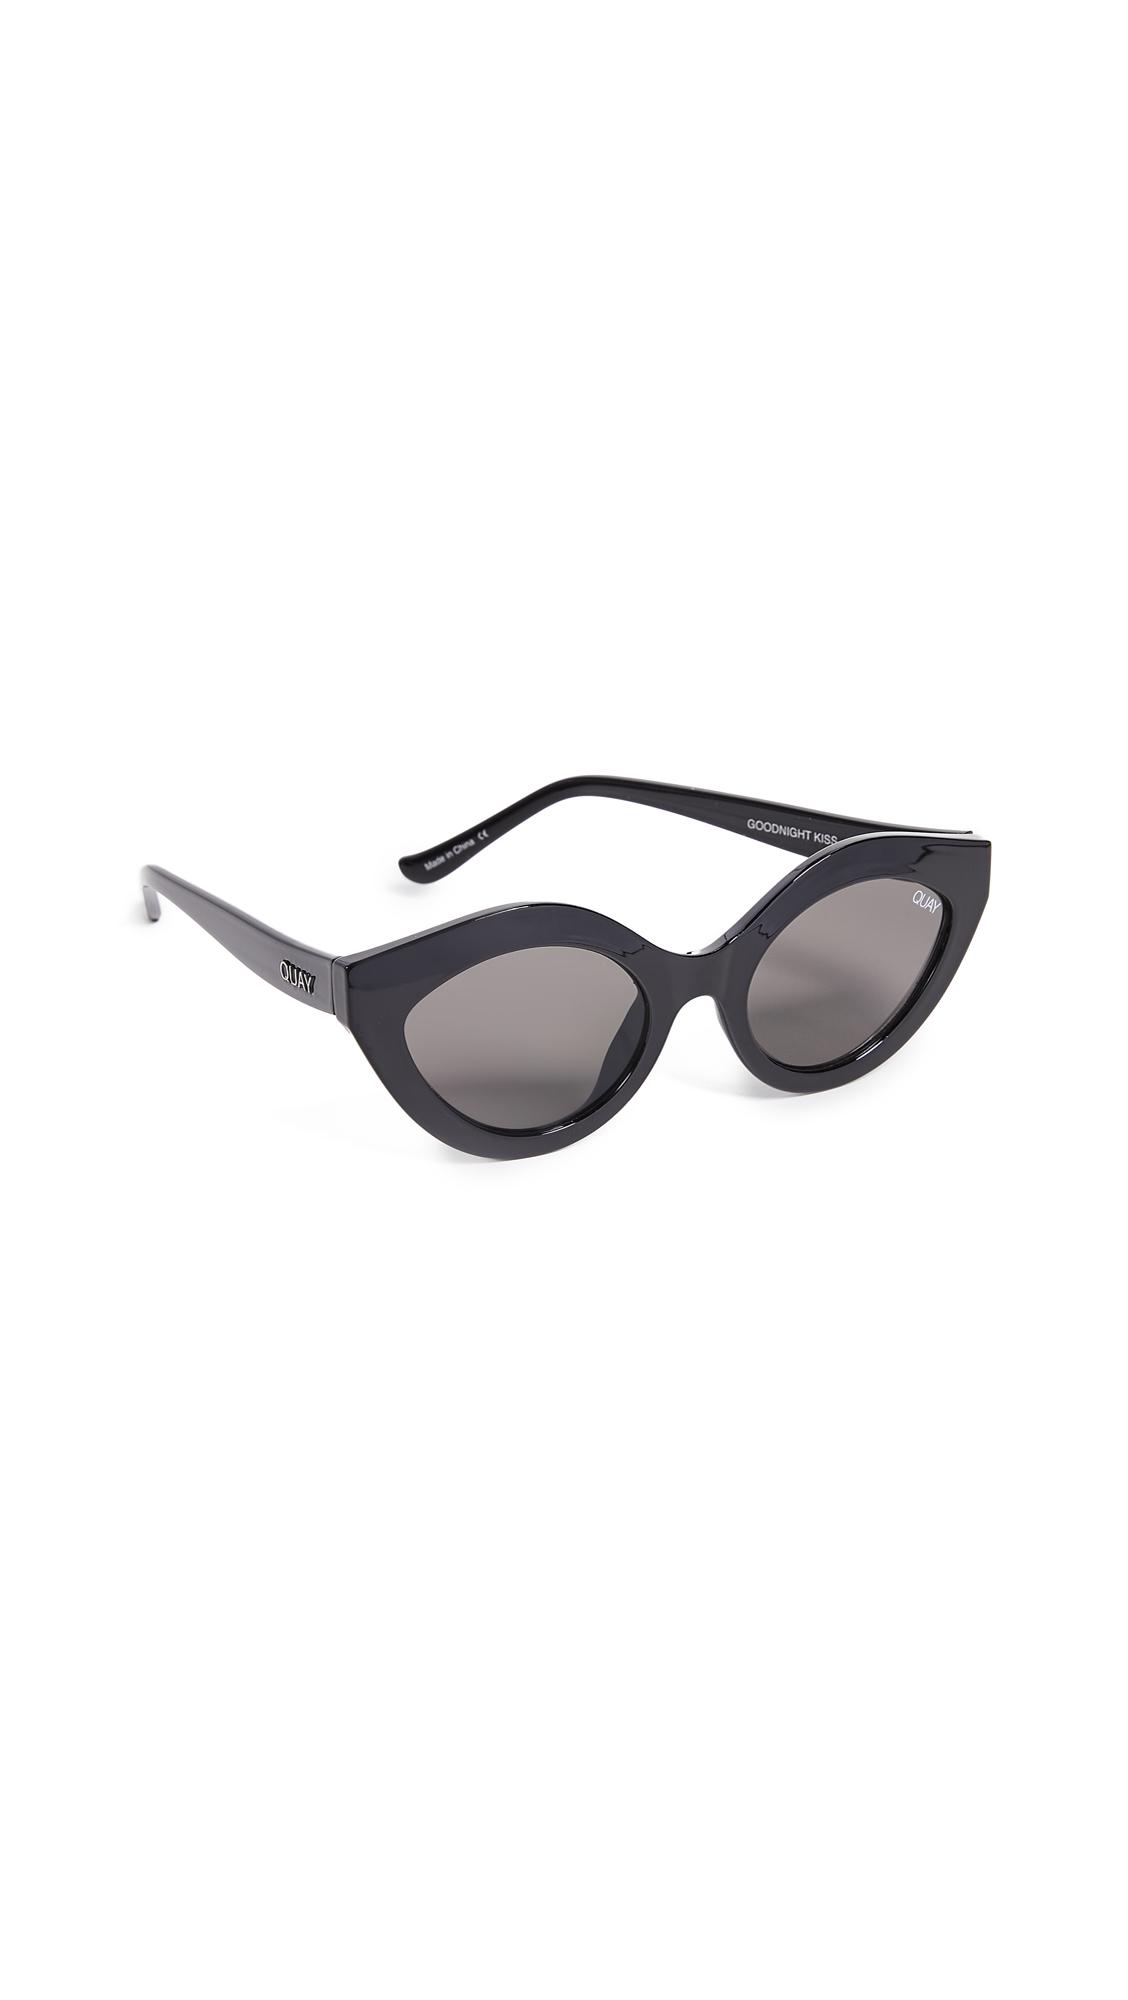 QUAY Goodnight Kiss Cat Eye Sunglasses - Black / Smoke in Black/Smoke